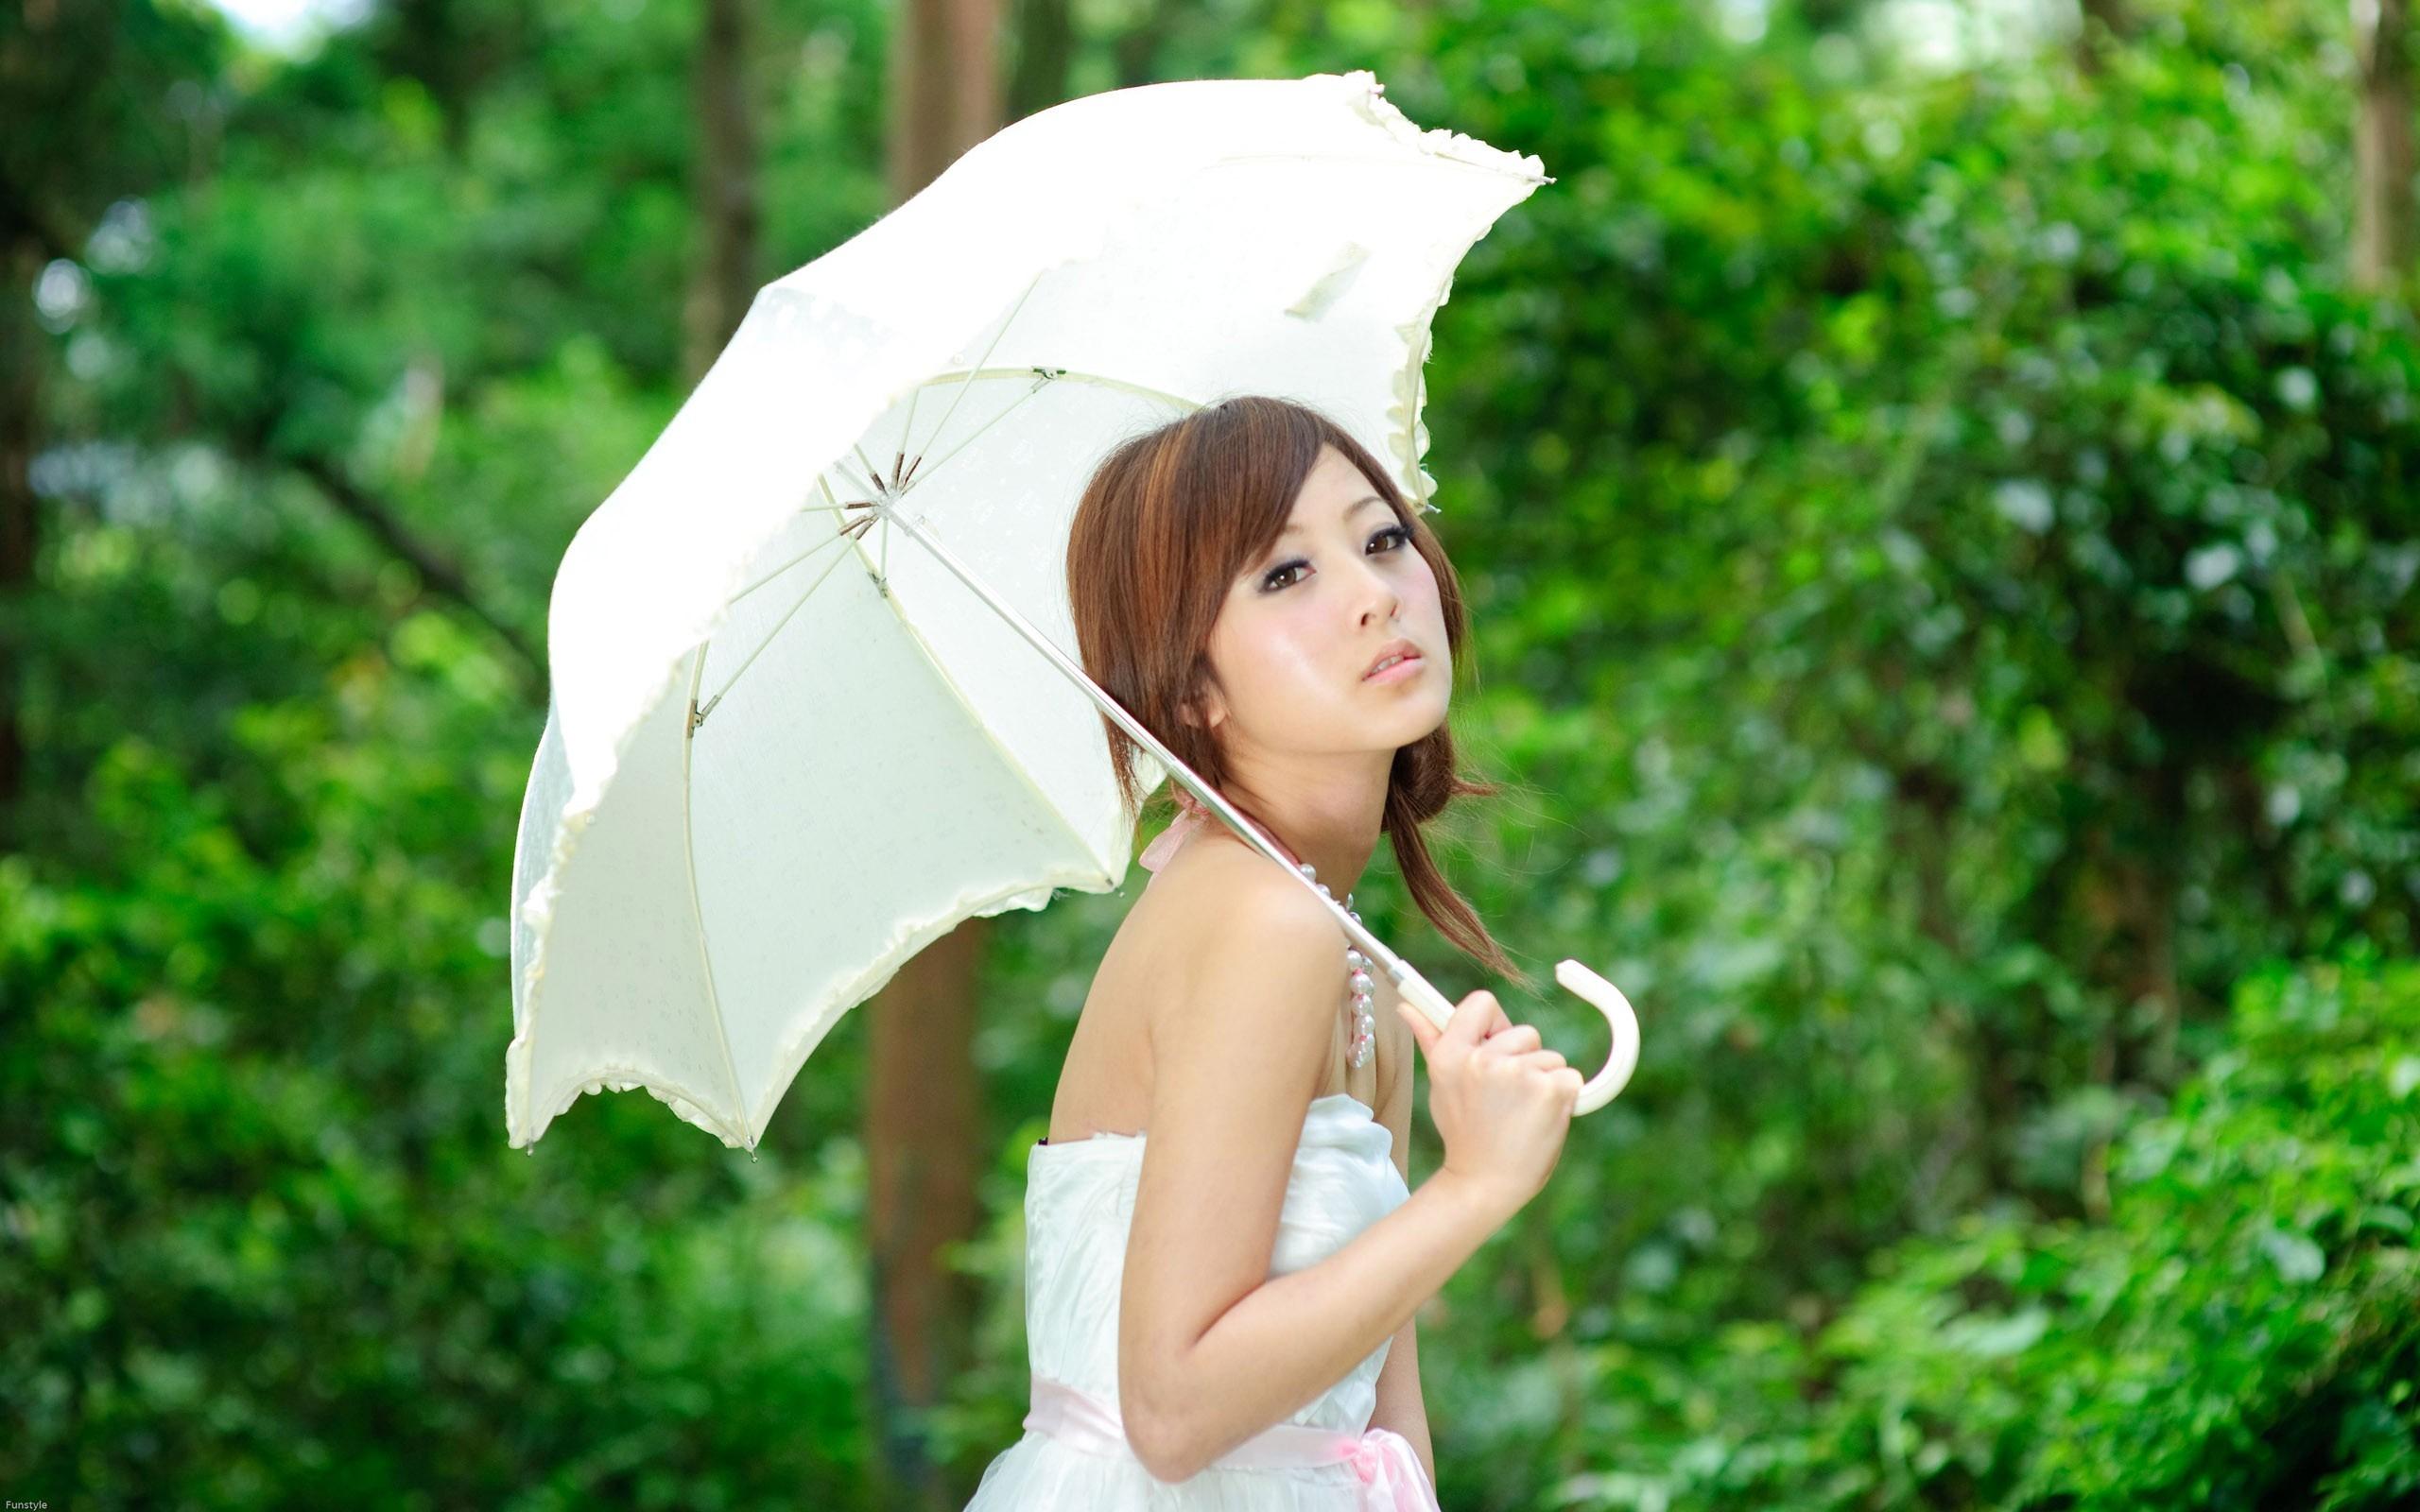 Mikako Zhang Kaijie Full Hd Wallpaper And Background Image  2560X1600  Id457139-3716